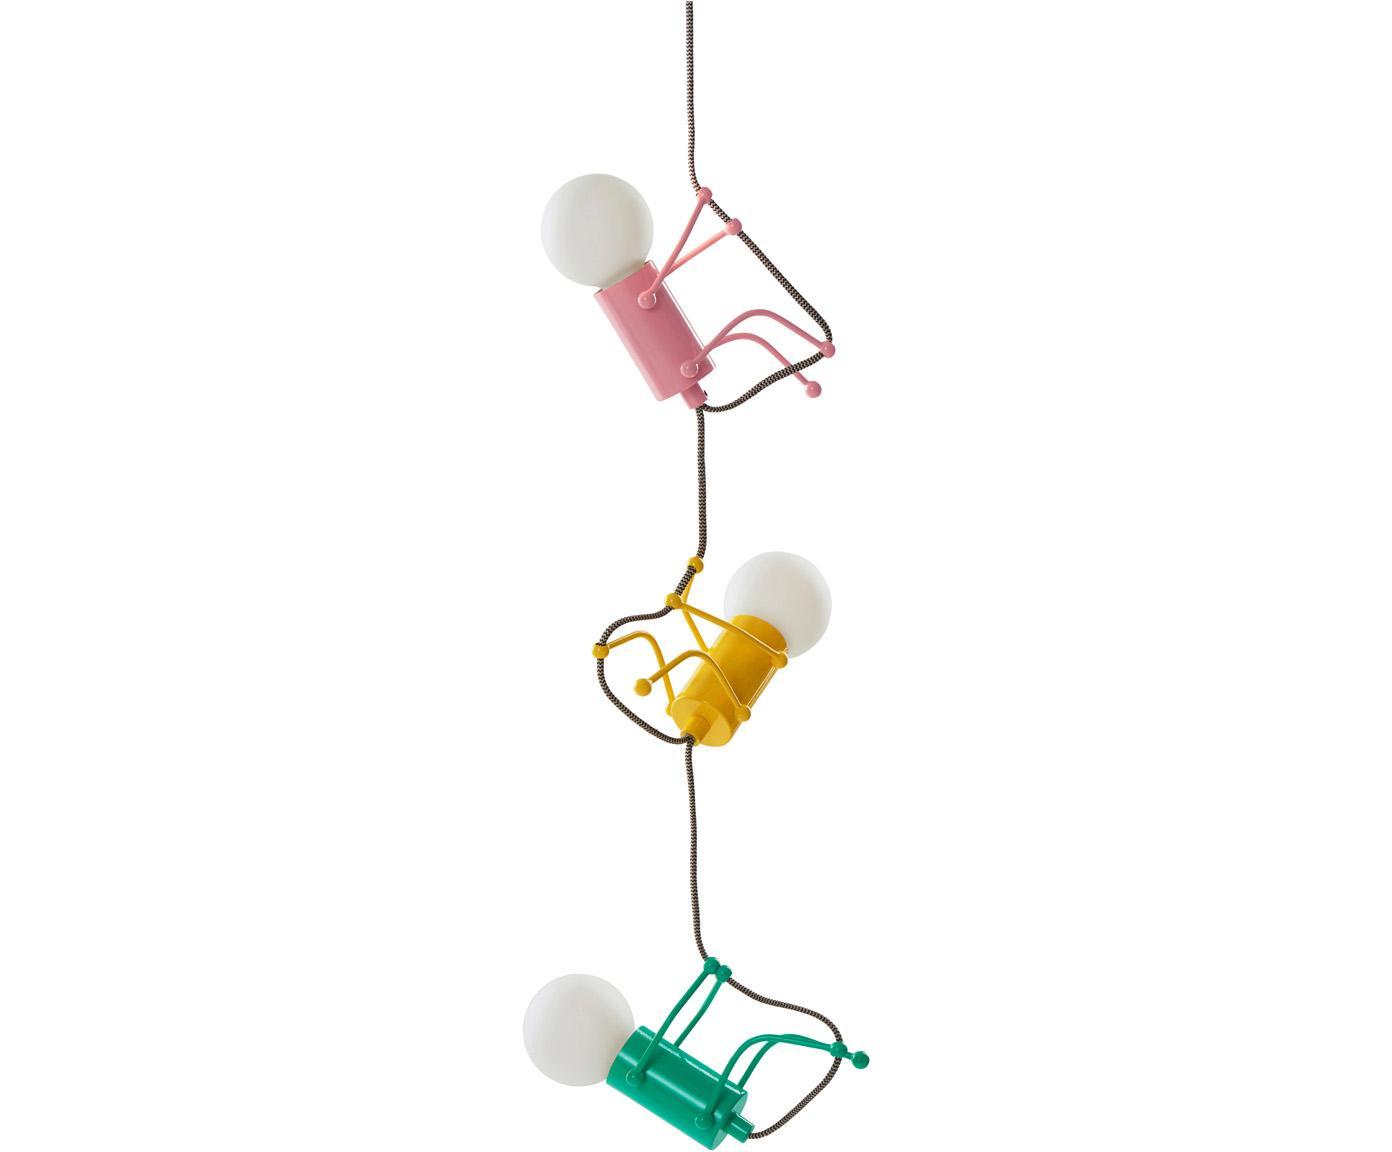 Pendelleuchte Chicos, Gelb, Grün, Rosa, Ø 18 x H 17 cm